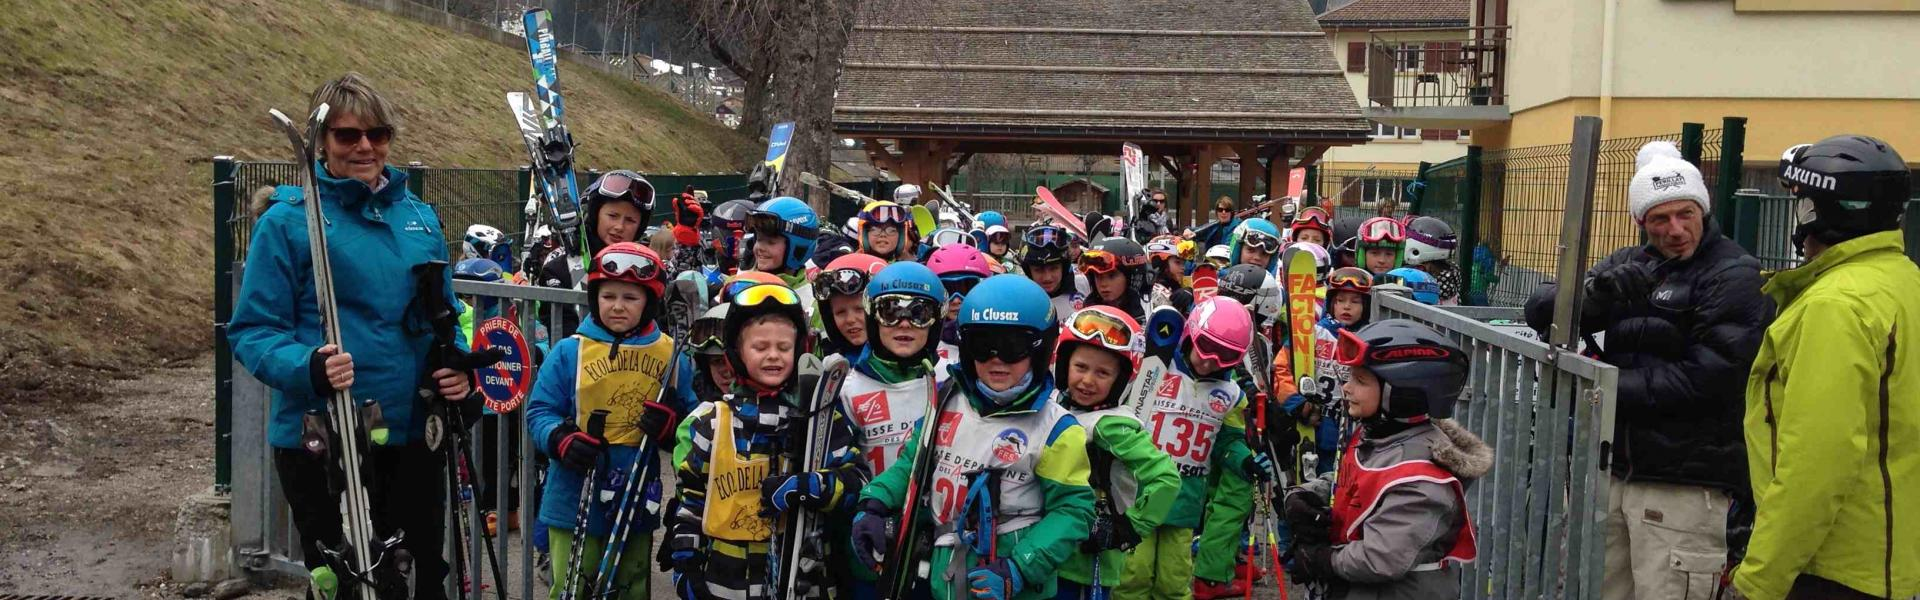 ski-alpin3.jpg